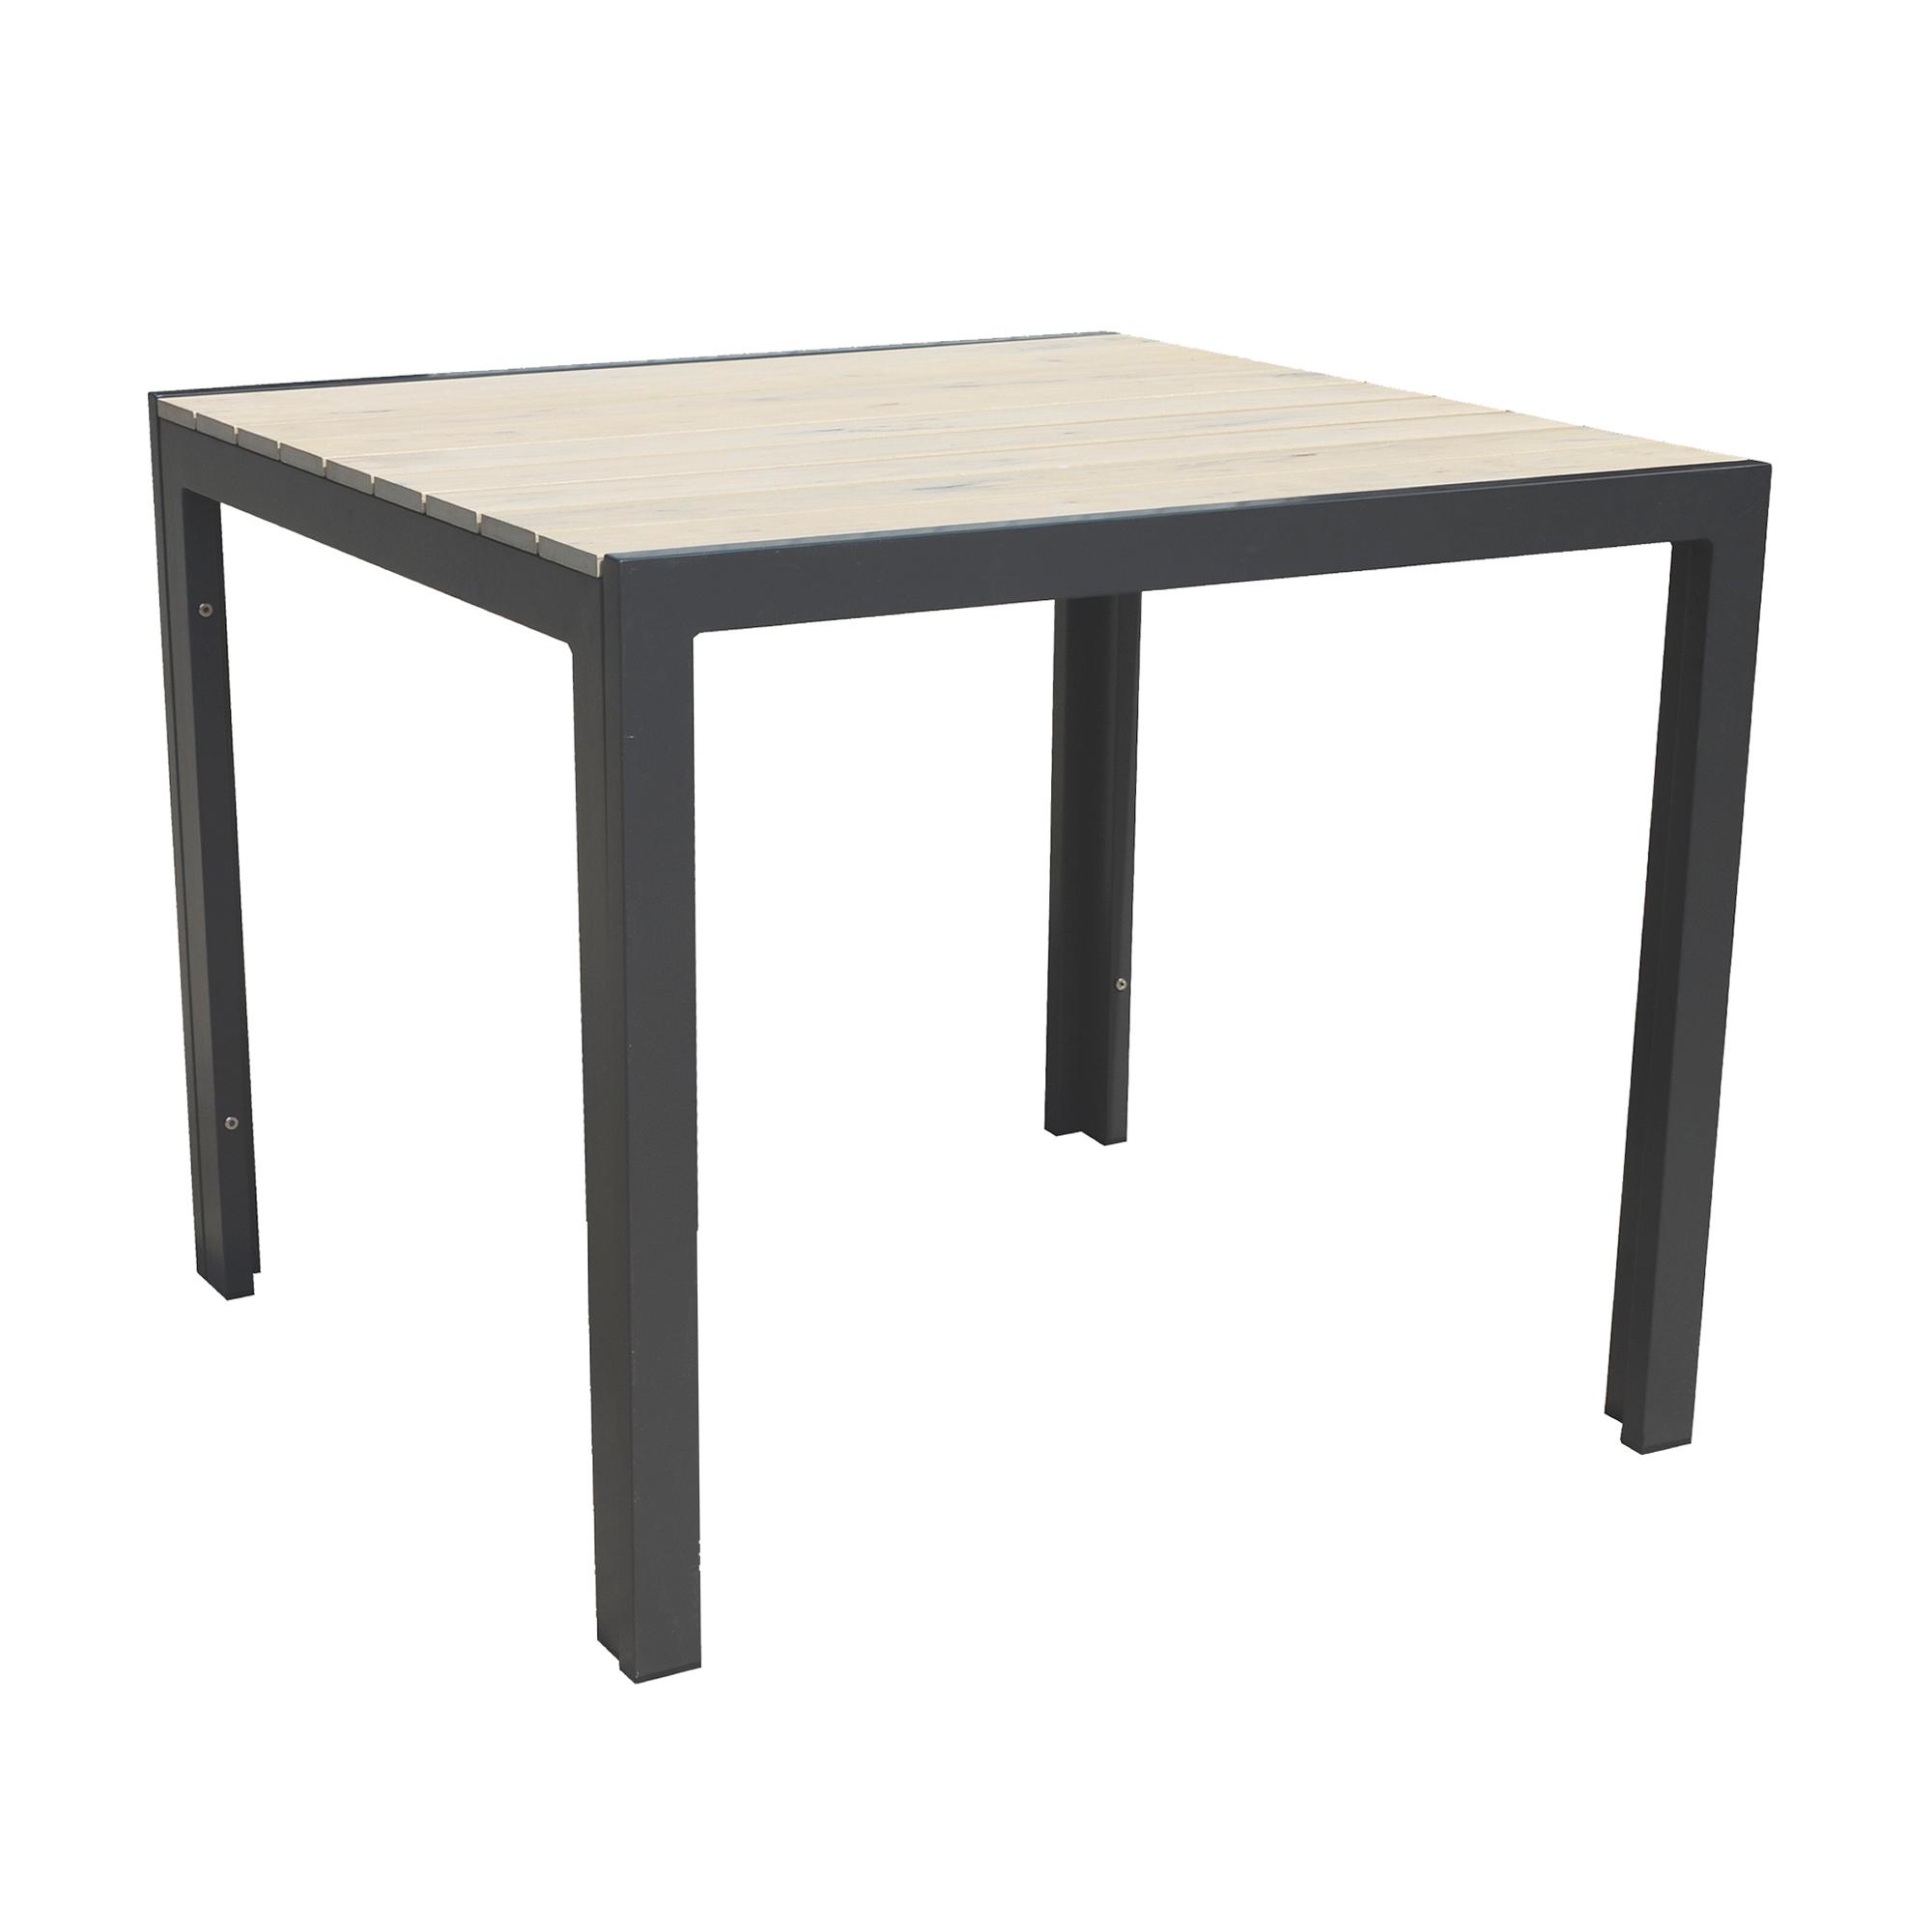 SenS-Line Tuintafel 'Jersey' 90 x 90cm, kleur zand